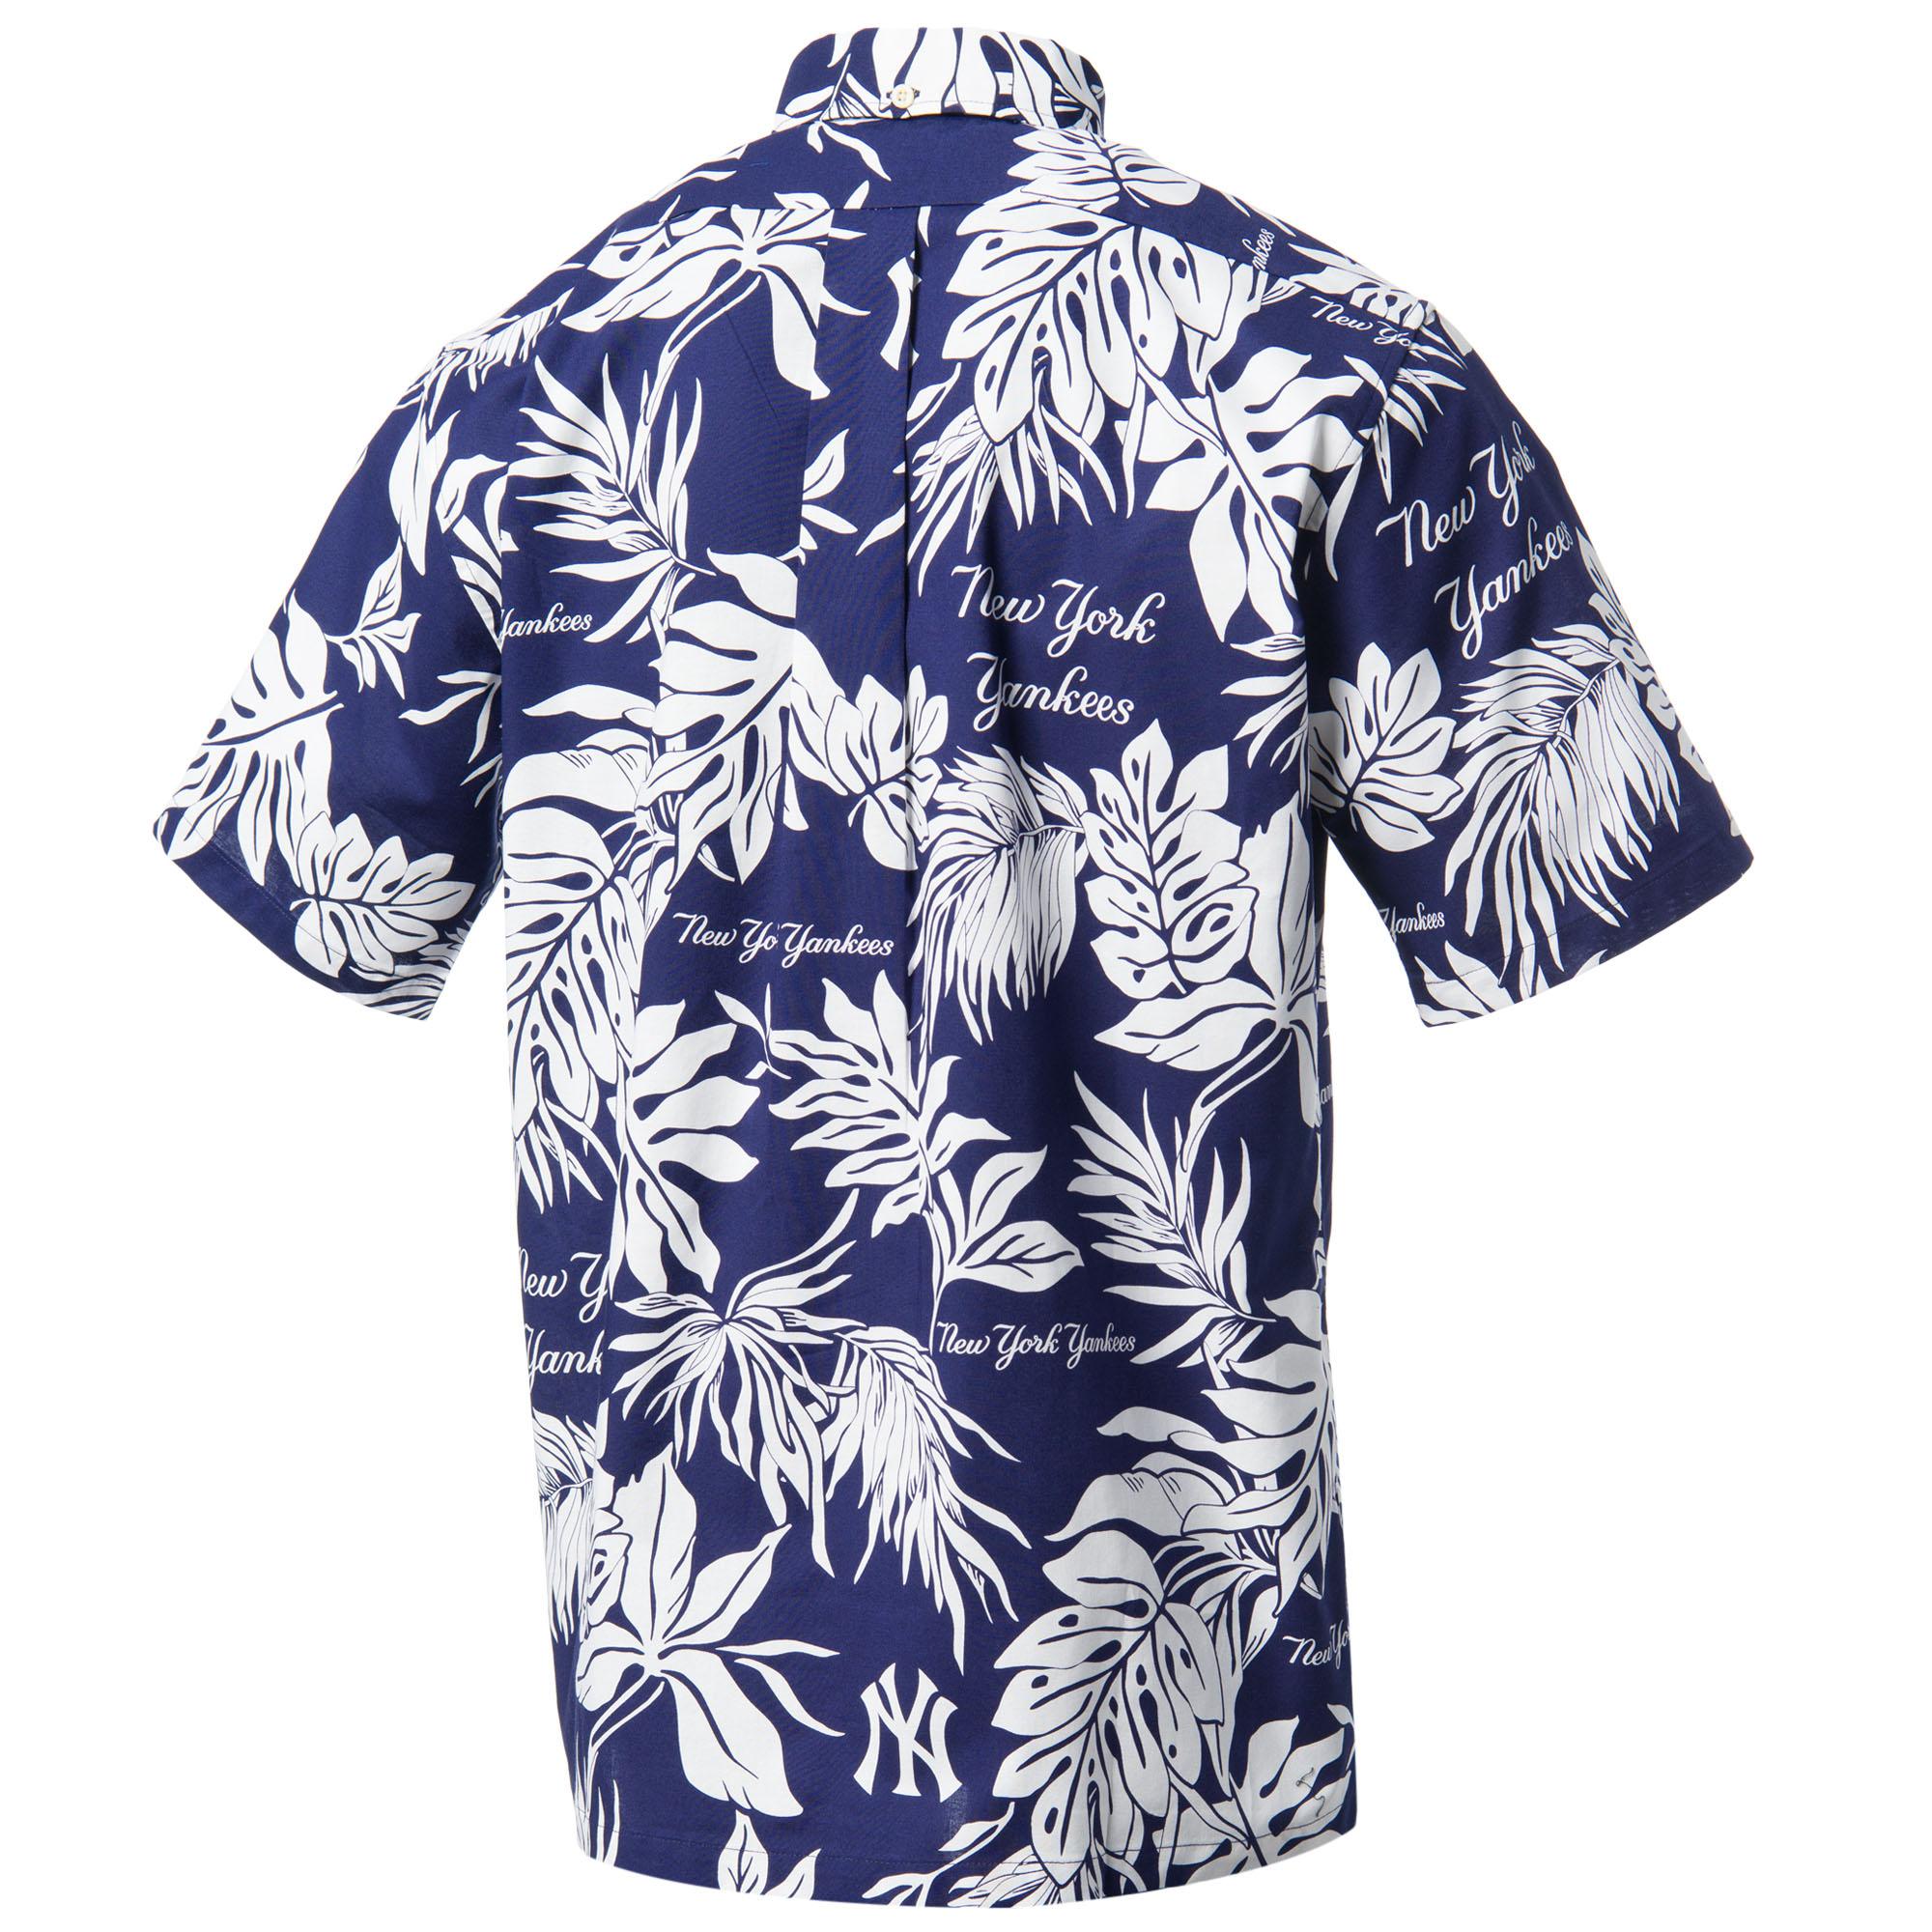 ab93e5cc Reyn Spooner Men's New York Yankees Aloha MLB Button Front Shirt - Sun &  Ski Sports